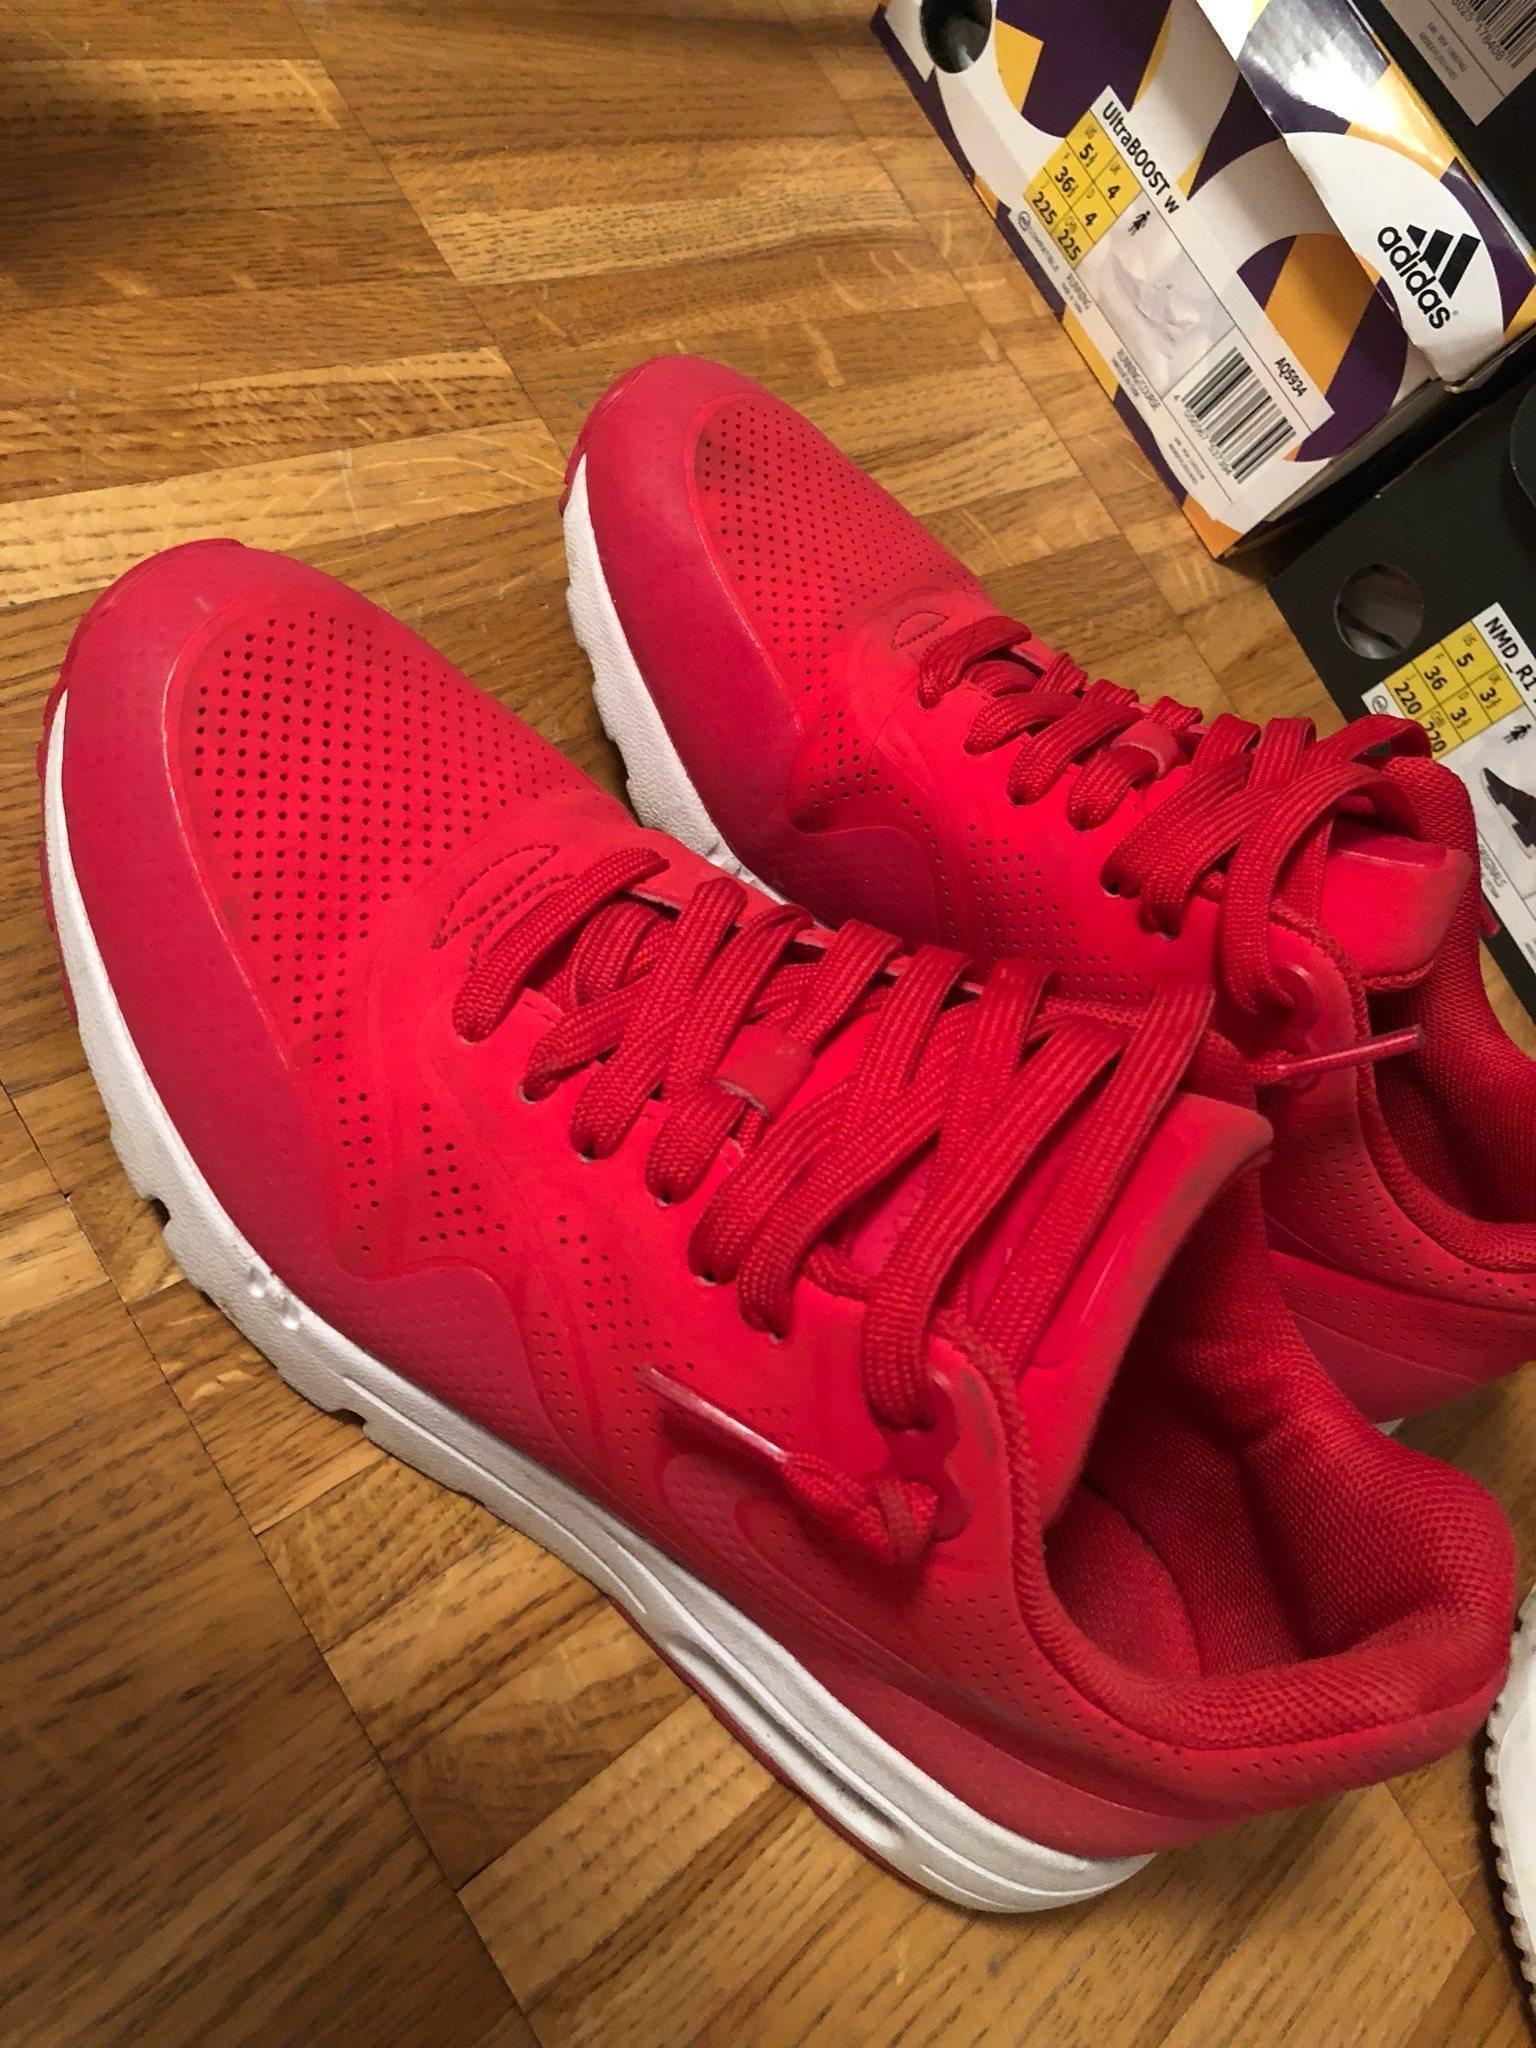 online retailer 10f14 67adb ... Skor Herr Butik SE930338  info for 82719 5d95b Nike air max röda